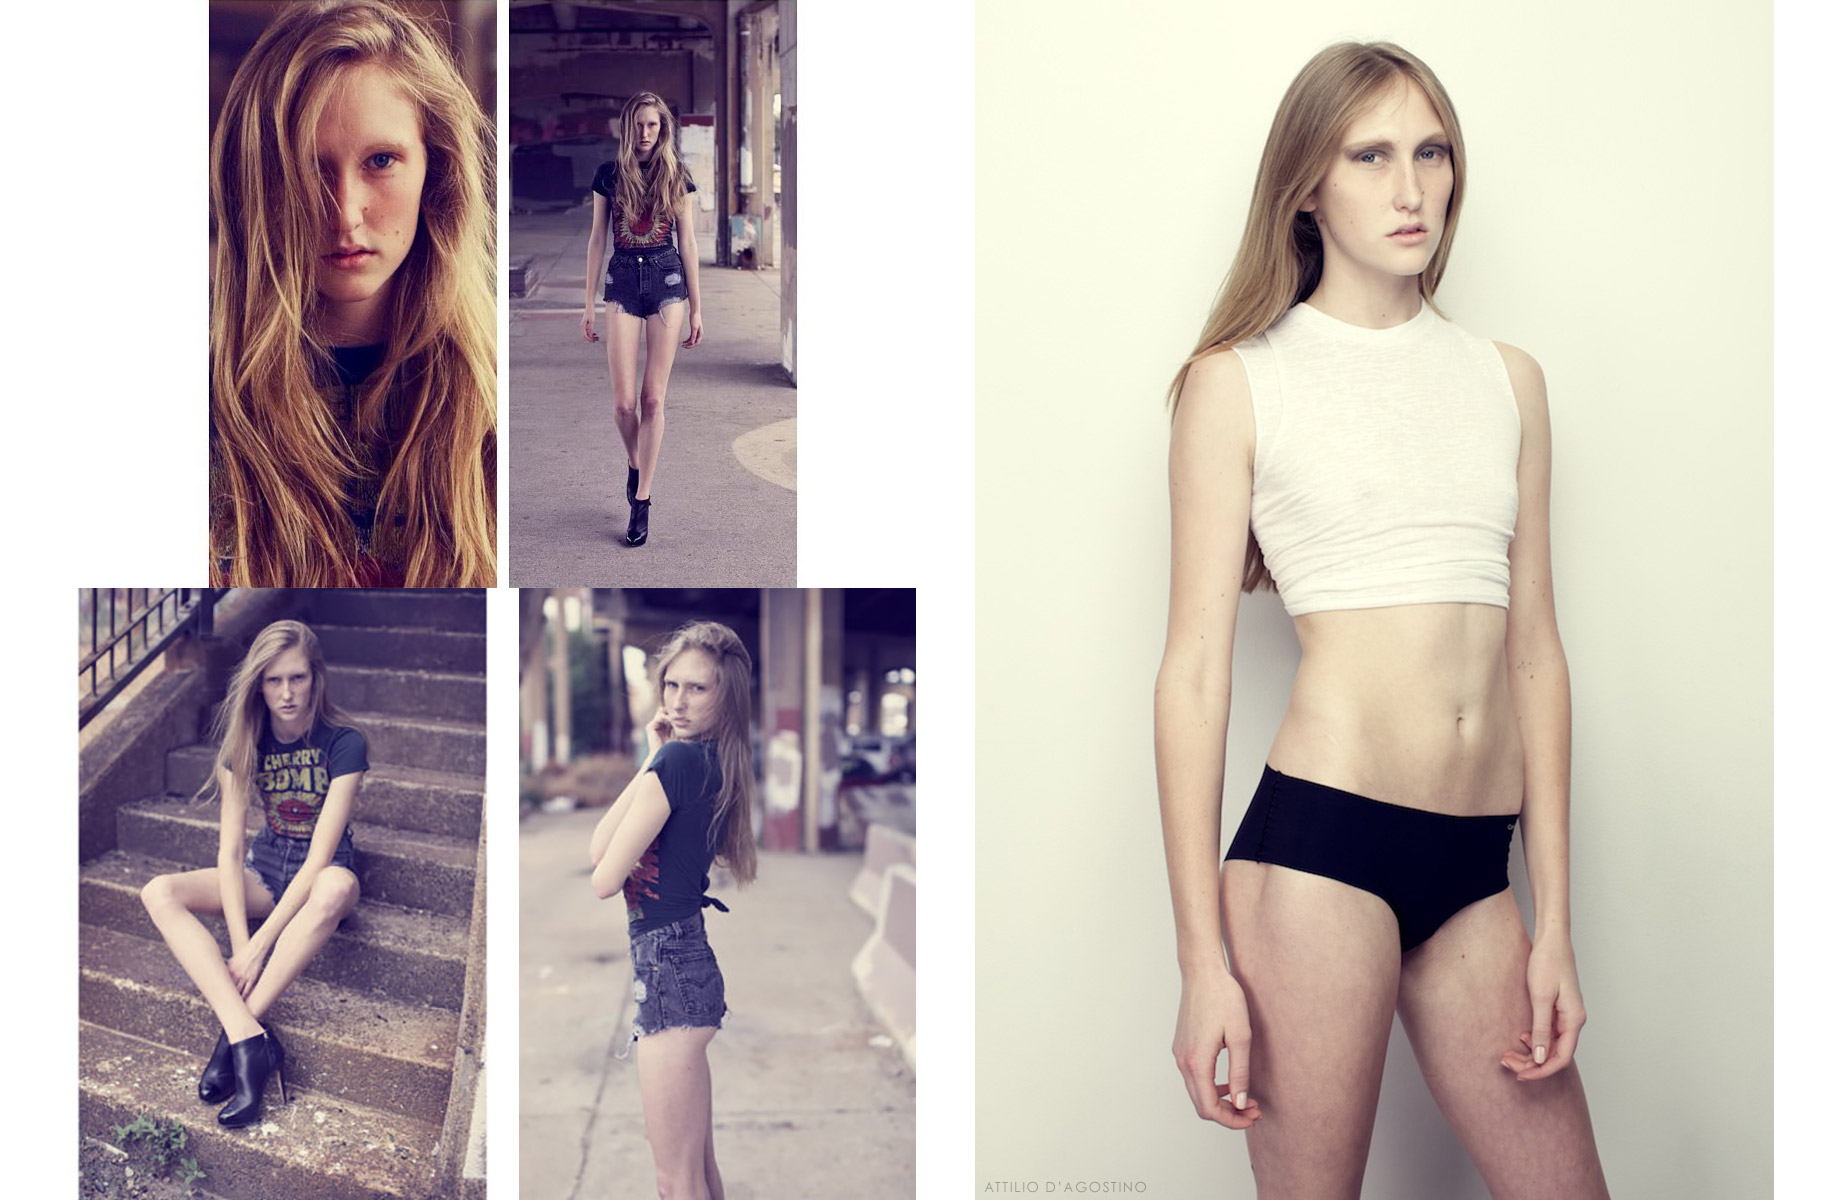 santa-fe-fashion-models-al.jpg